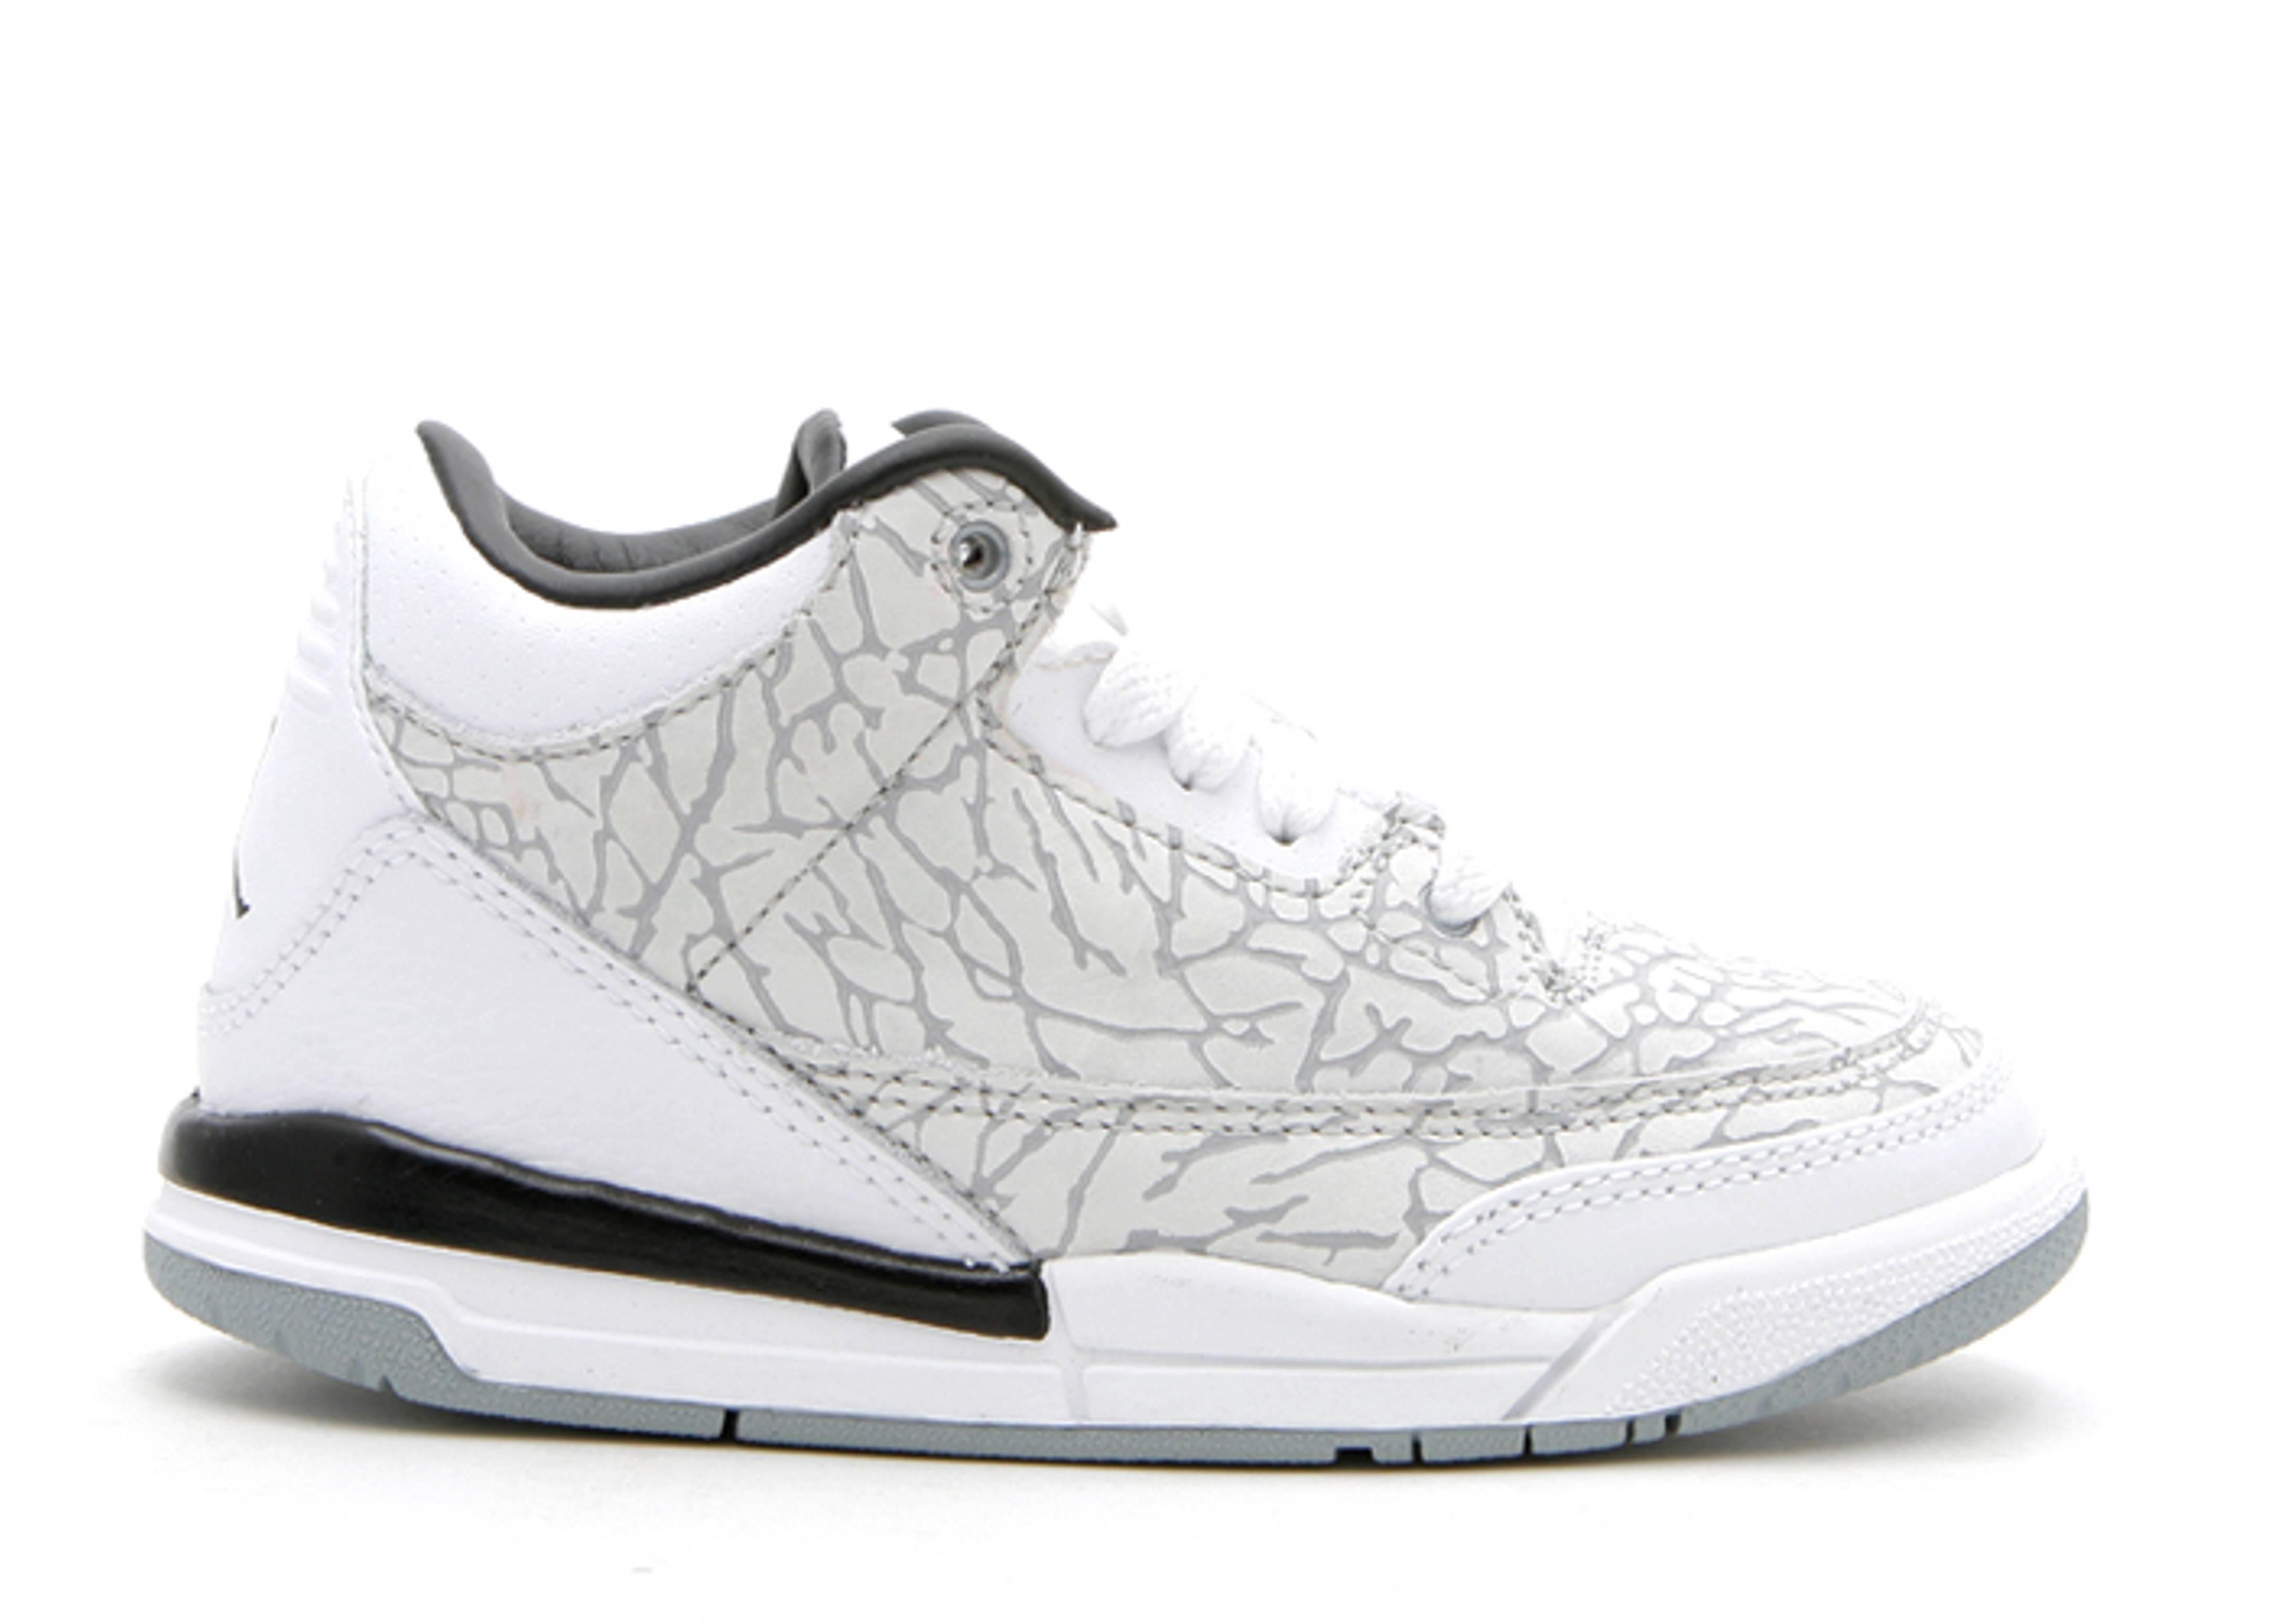 74608dcfda76e5 Jordan 3 Retro Flip (ps) - Air Jordan - 315769 101 - white chrome-varsity  red-black